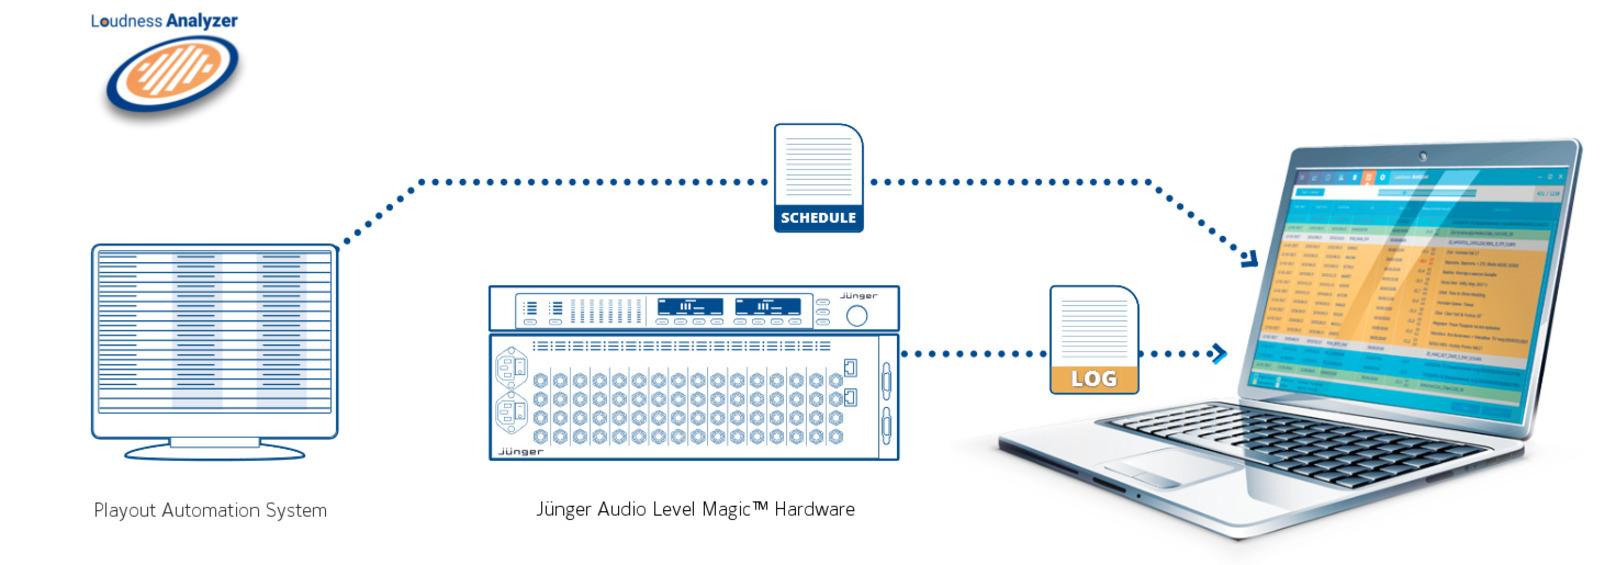 Measurement and Logging Software Tools - Jünger Audio